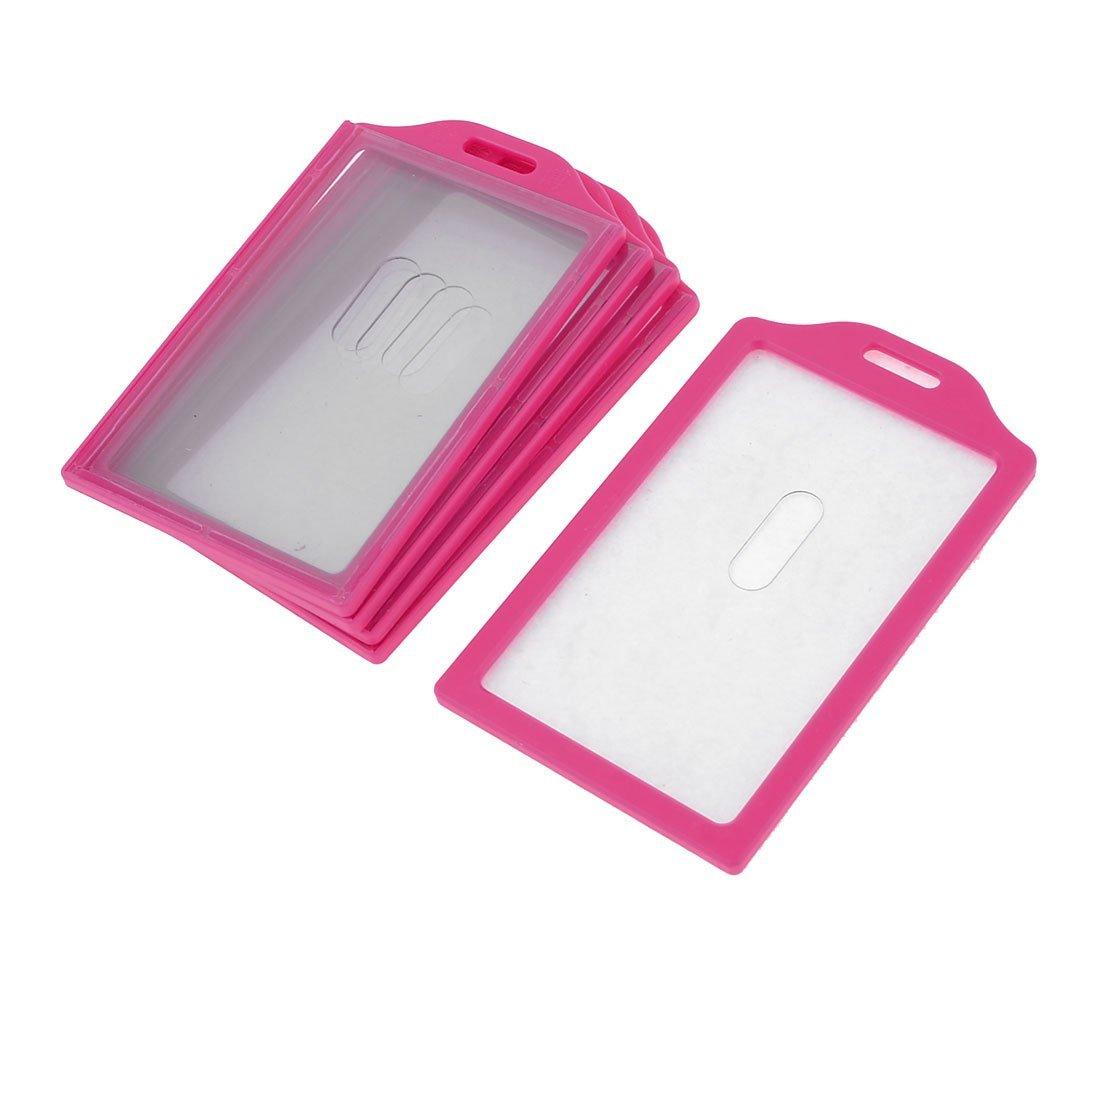 Uxcell Plastic Frame School Slide ID Card Holder, 84 x 52 mm, 5-Piece, Fuchsia